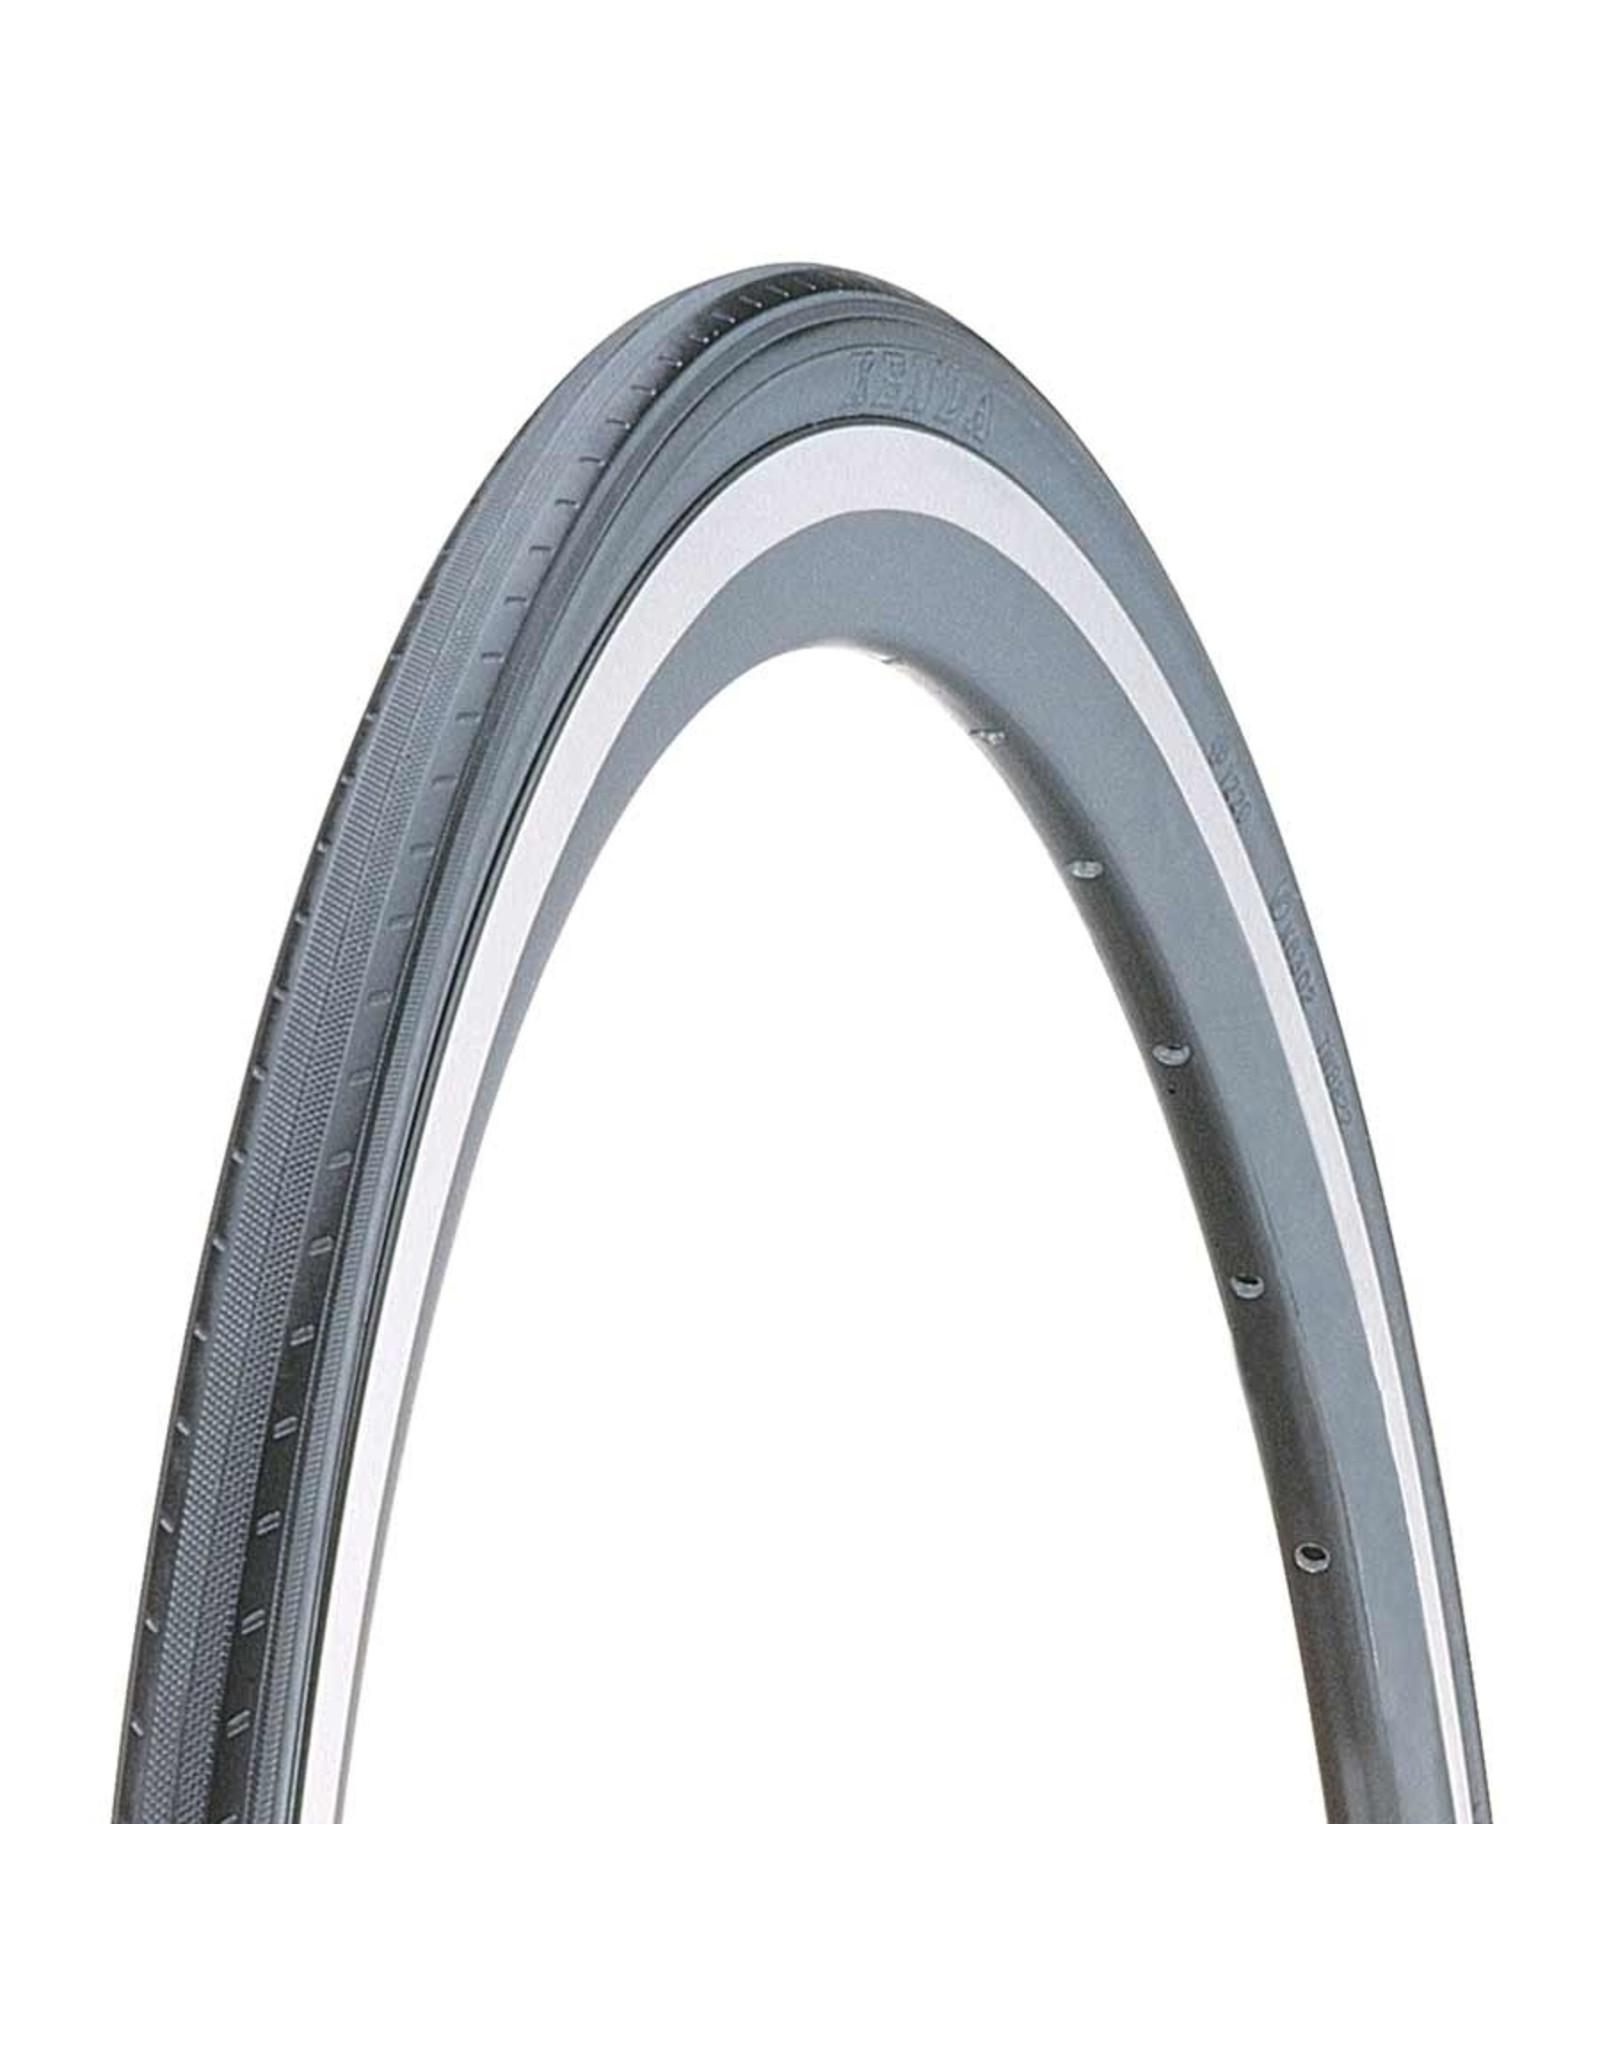 Kenda Kenda, K191, Tire, 650x23C, Folding, Clincher, SRC, 60TPI, Black